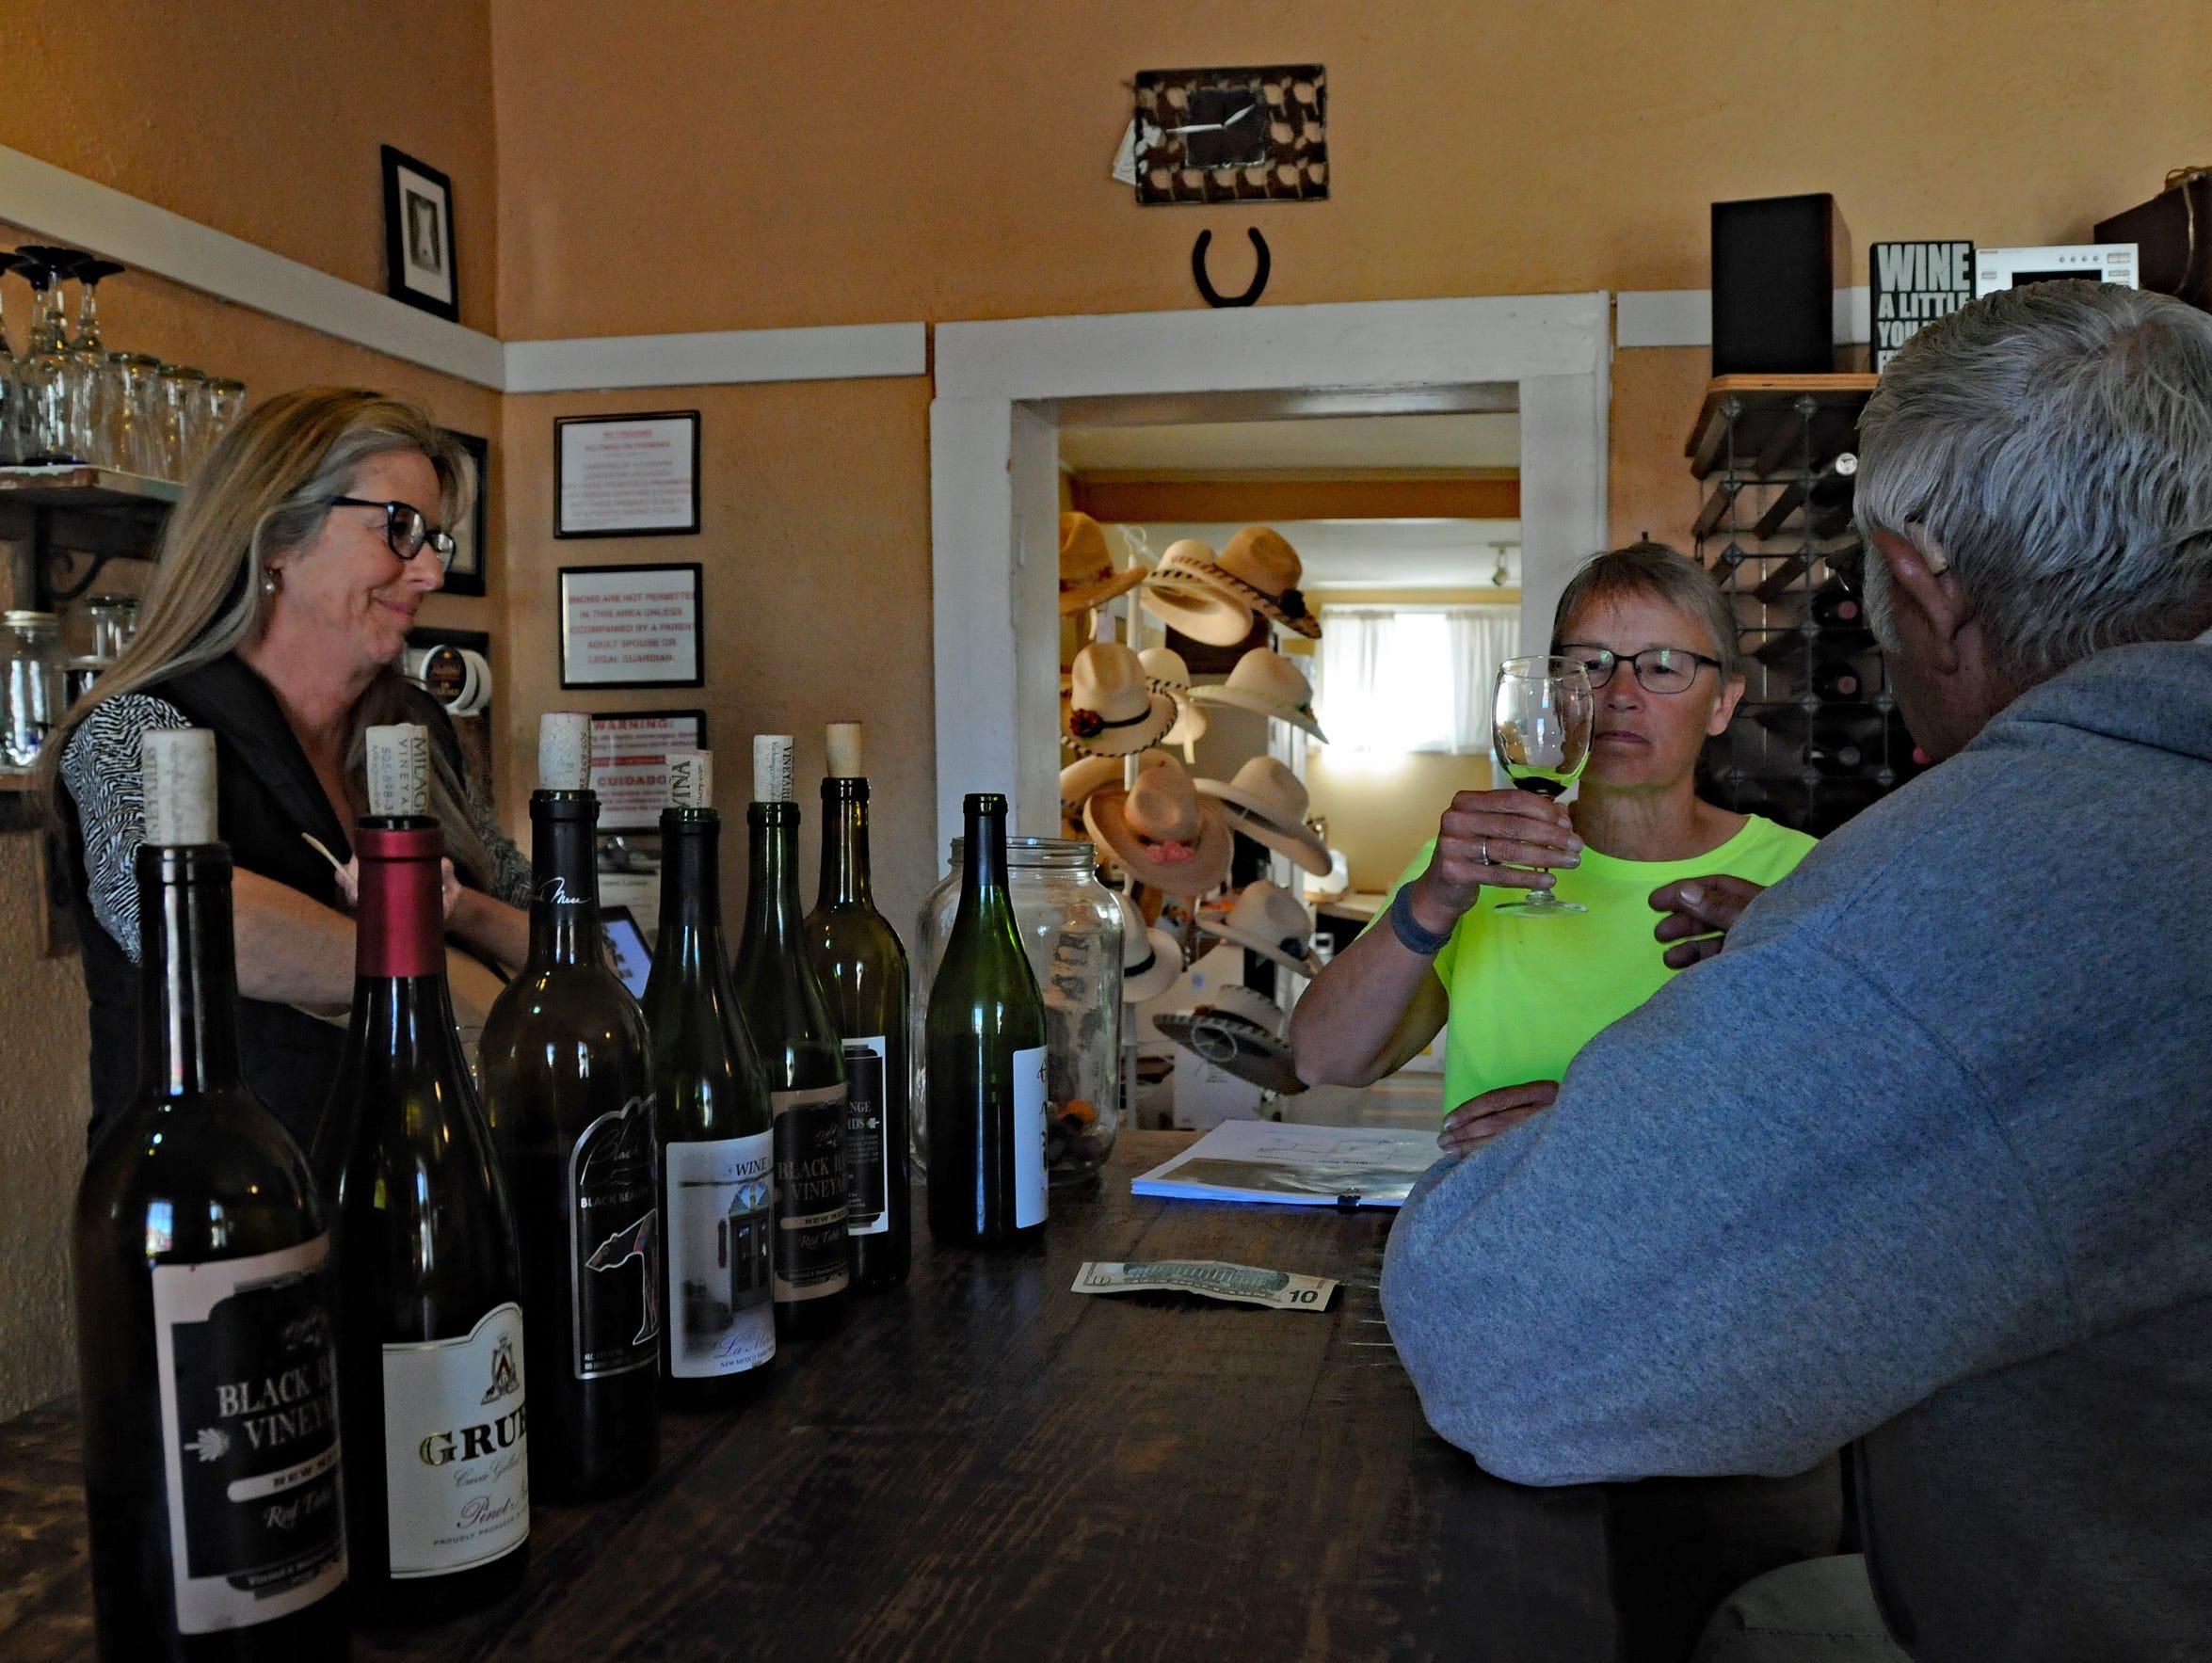 Barb Payla of Minnesota samples wine at the Black Range